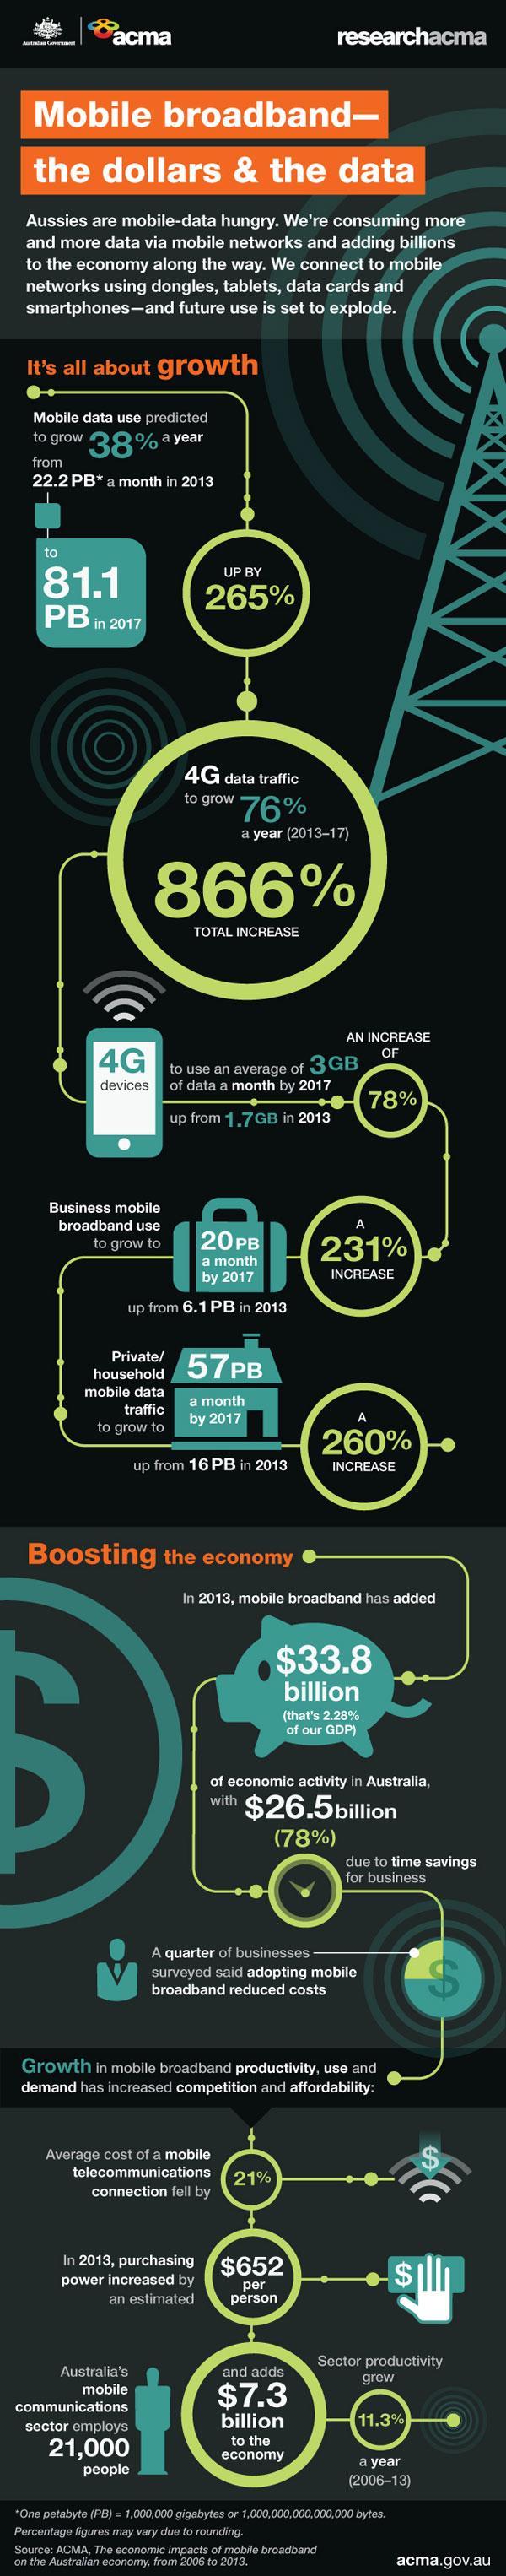 Moible broadband